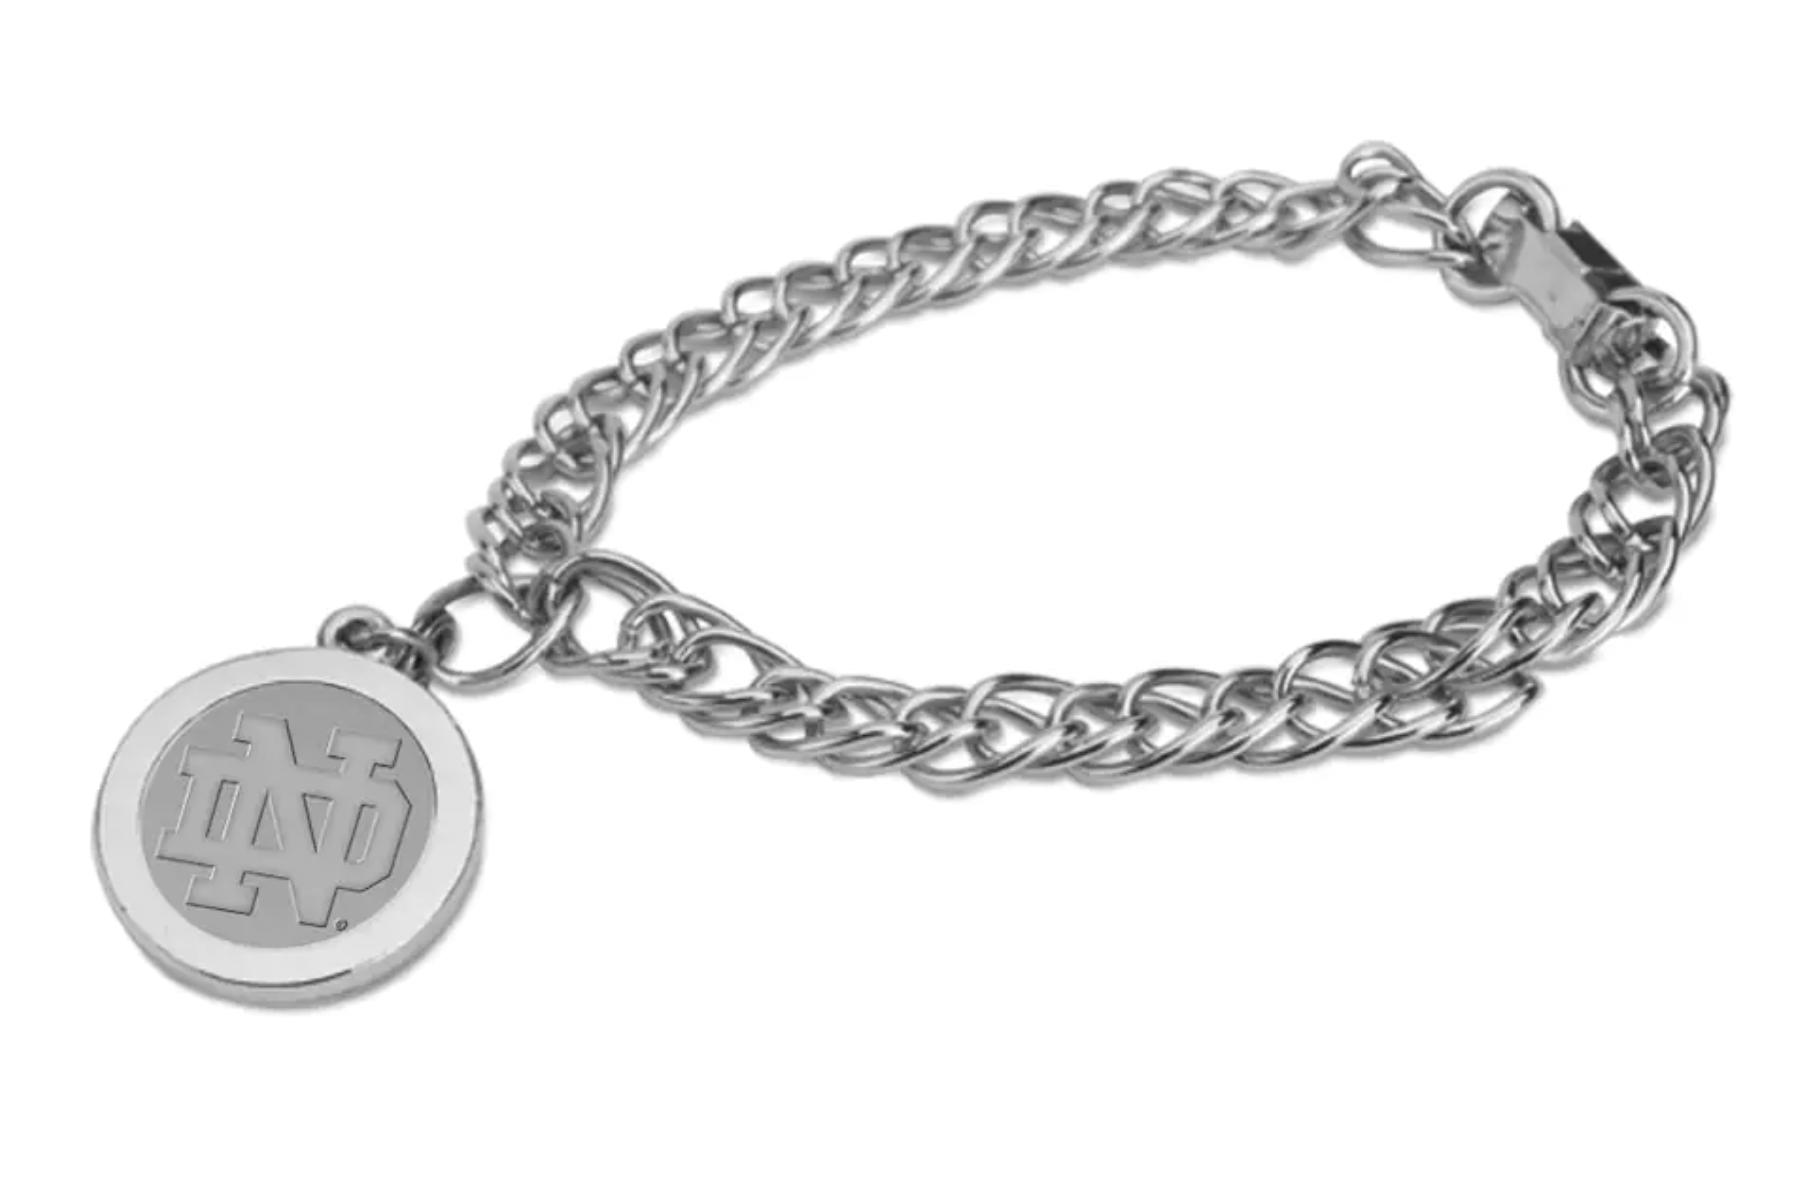 Notre Dame Fighting Irish Silver Charm Bracelet